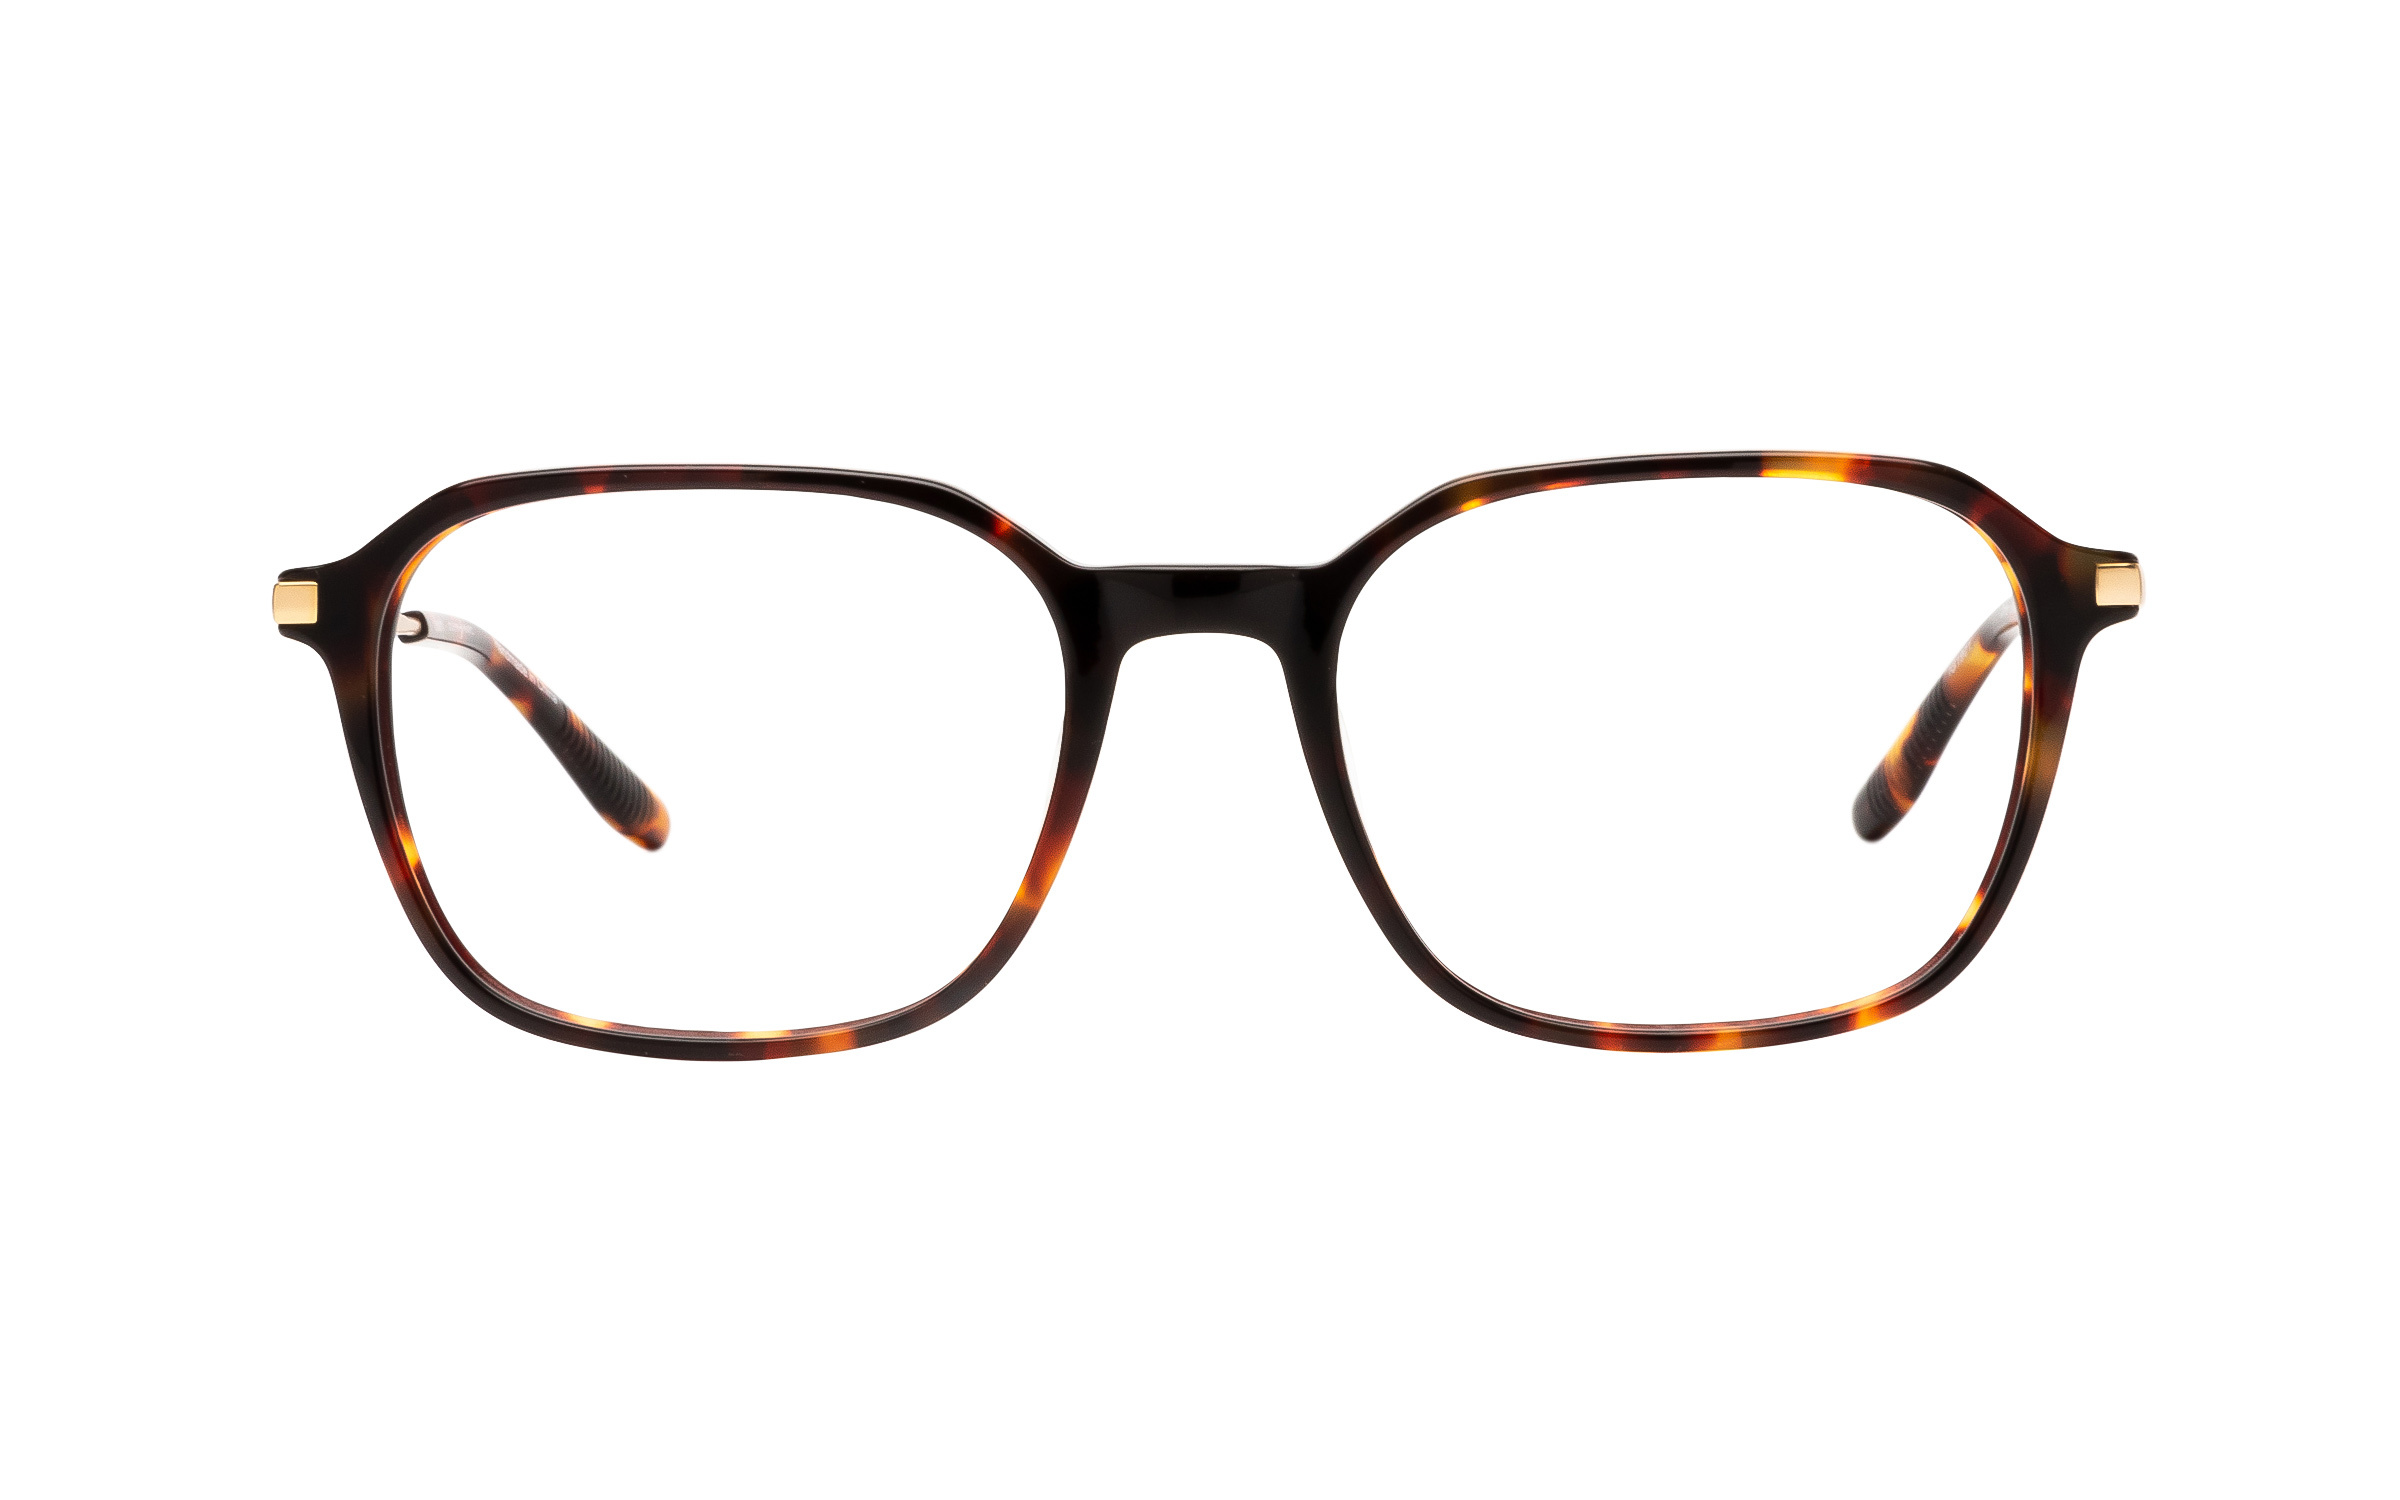 Joseph Marc Carter (52) Eyeglasses and Frame in Havana Tortoise/Brown | Acetate/Metal